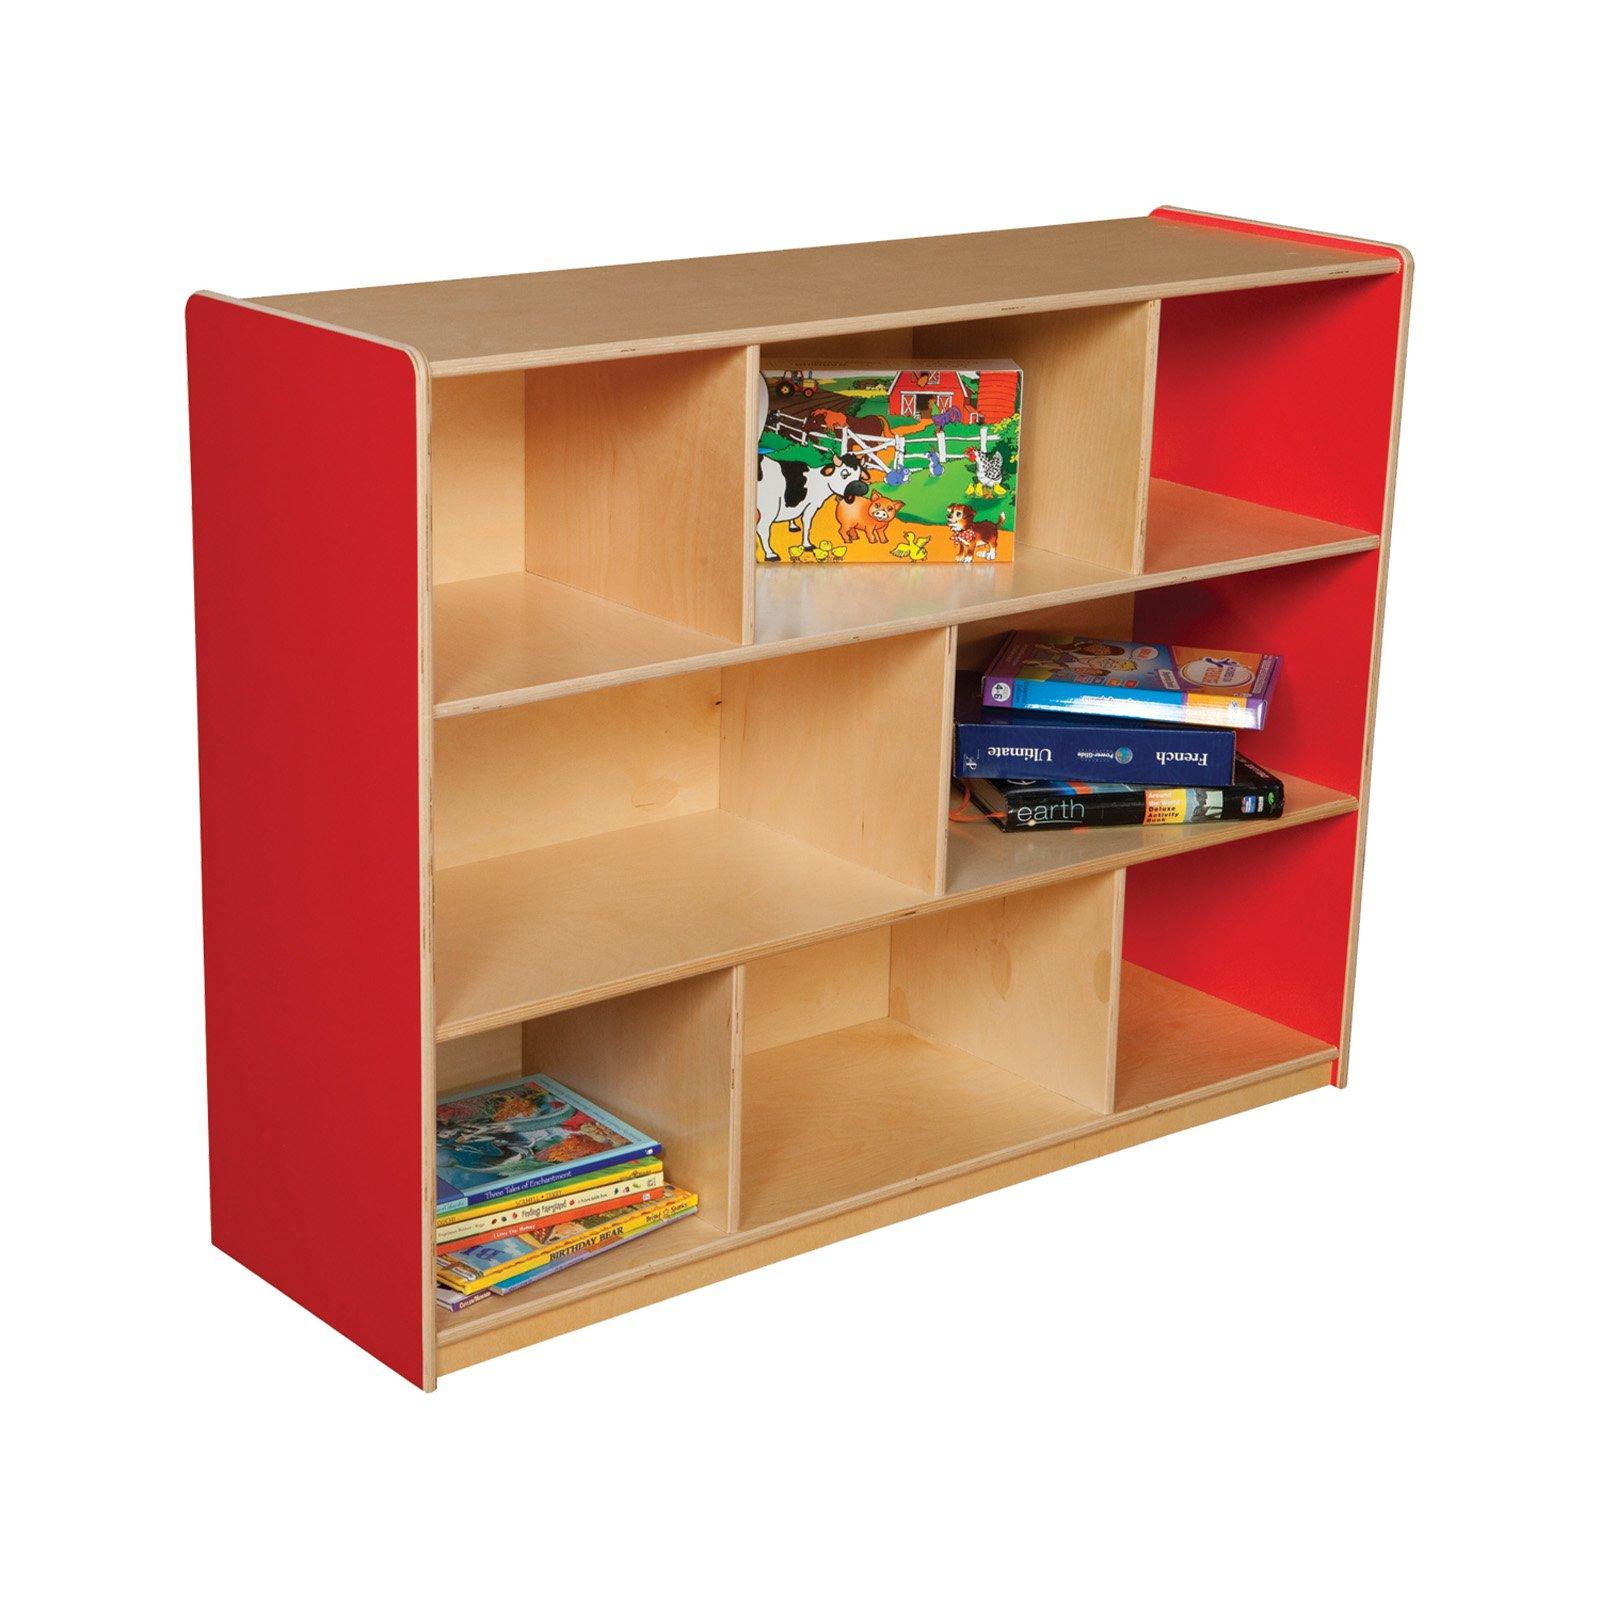 Wood Designs 36H in. Single Storage